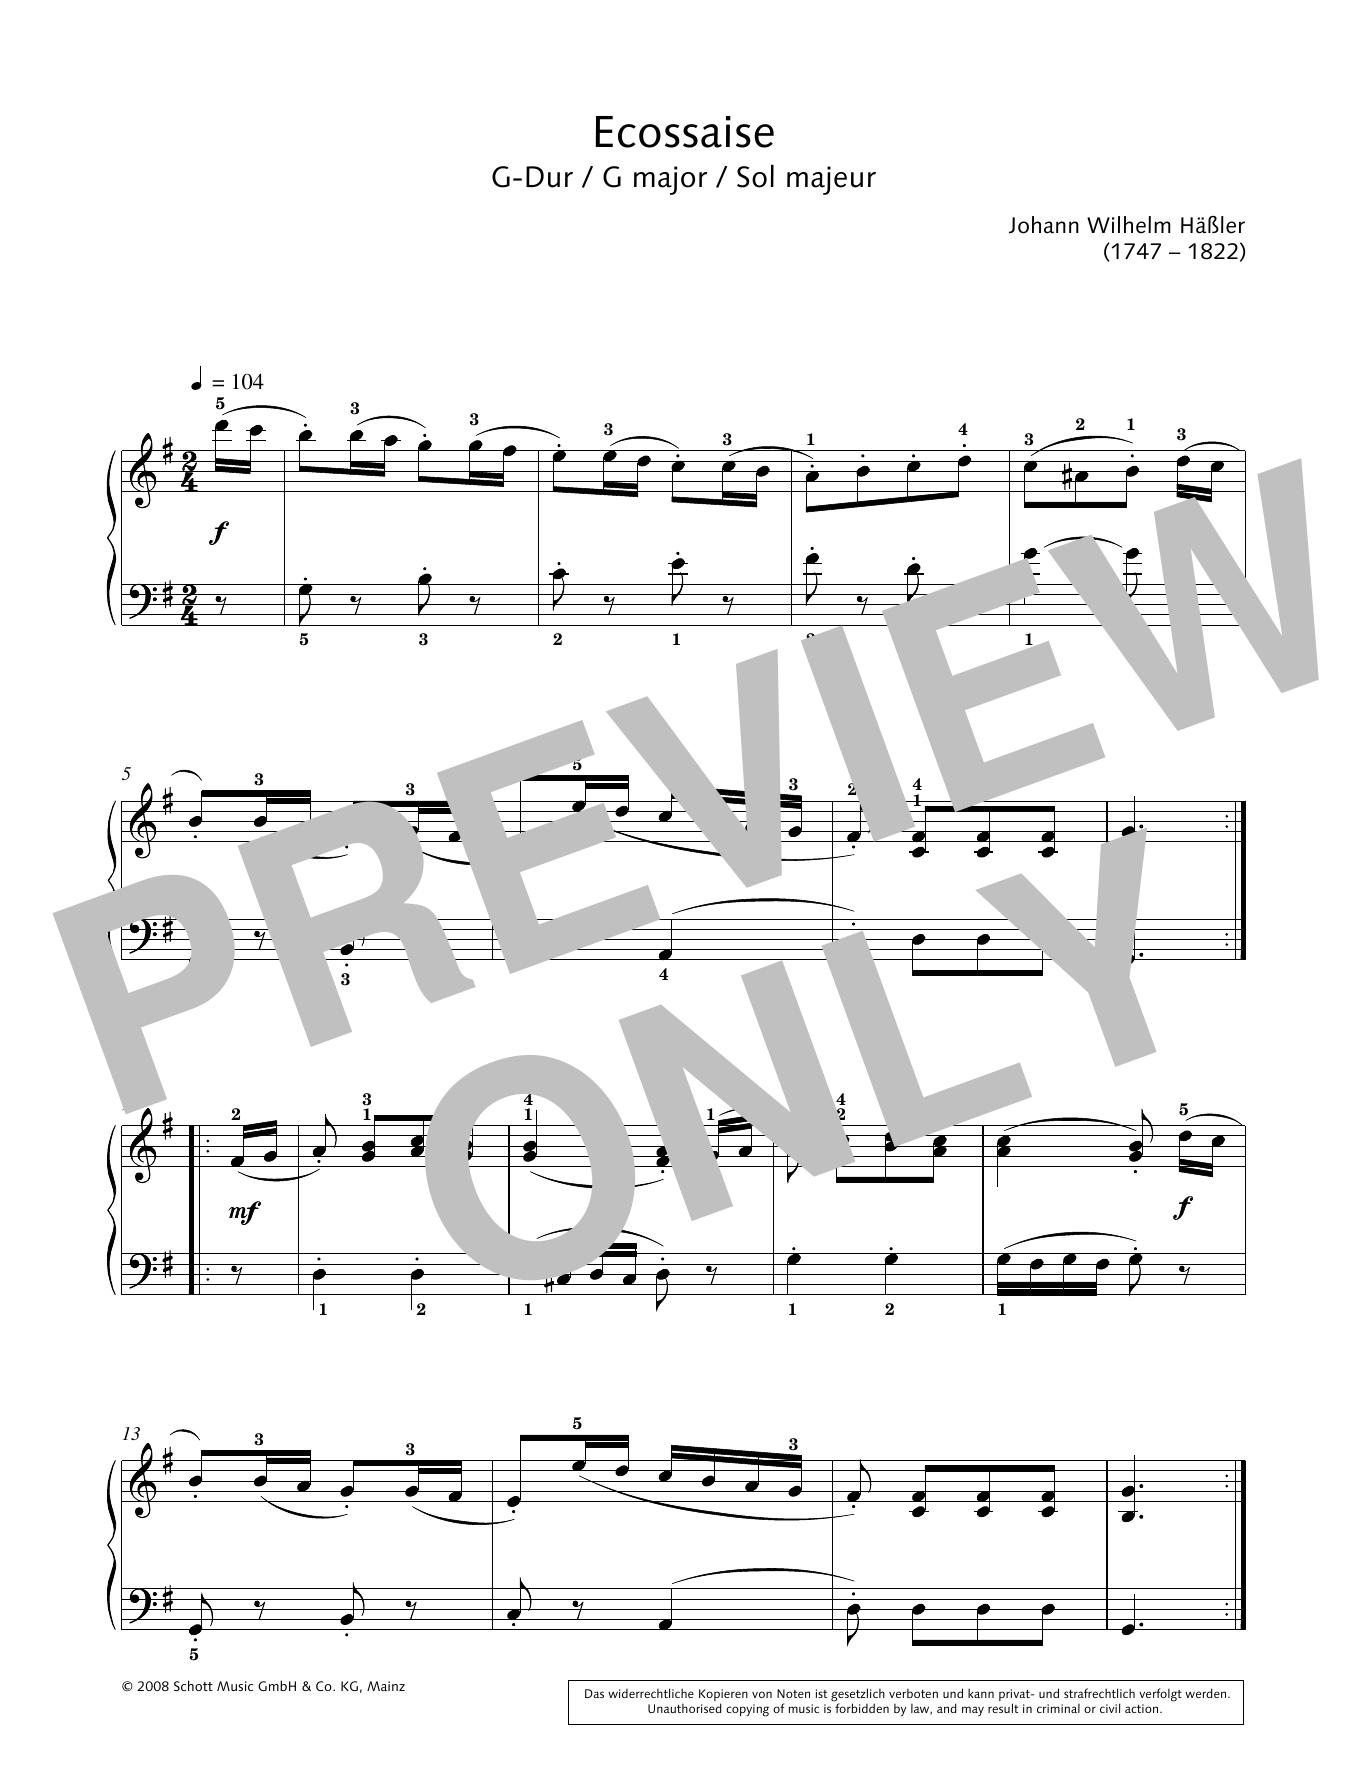 Ecossaise in G major Sheet Music